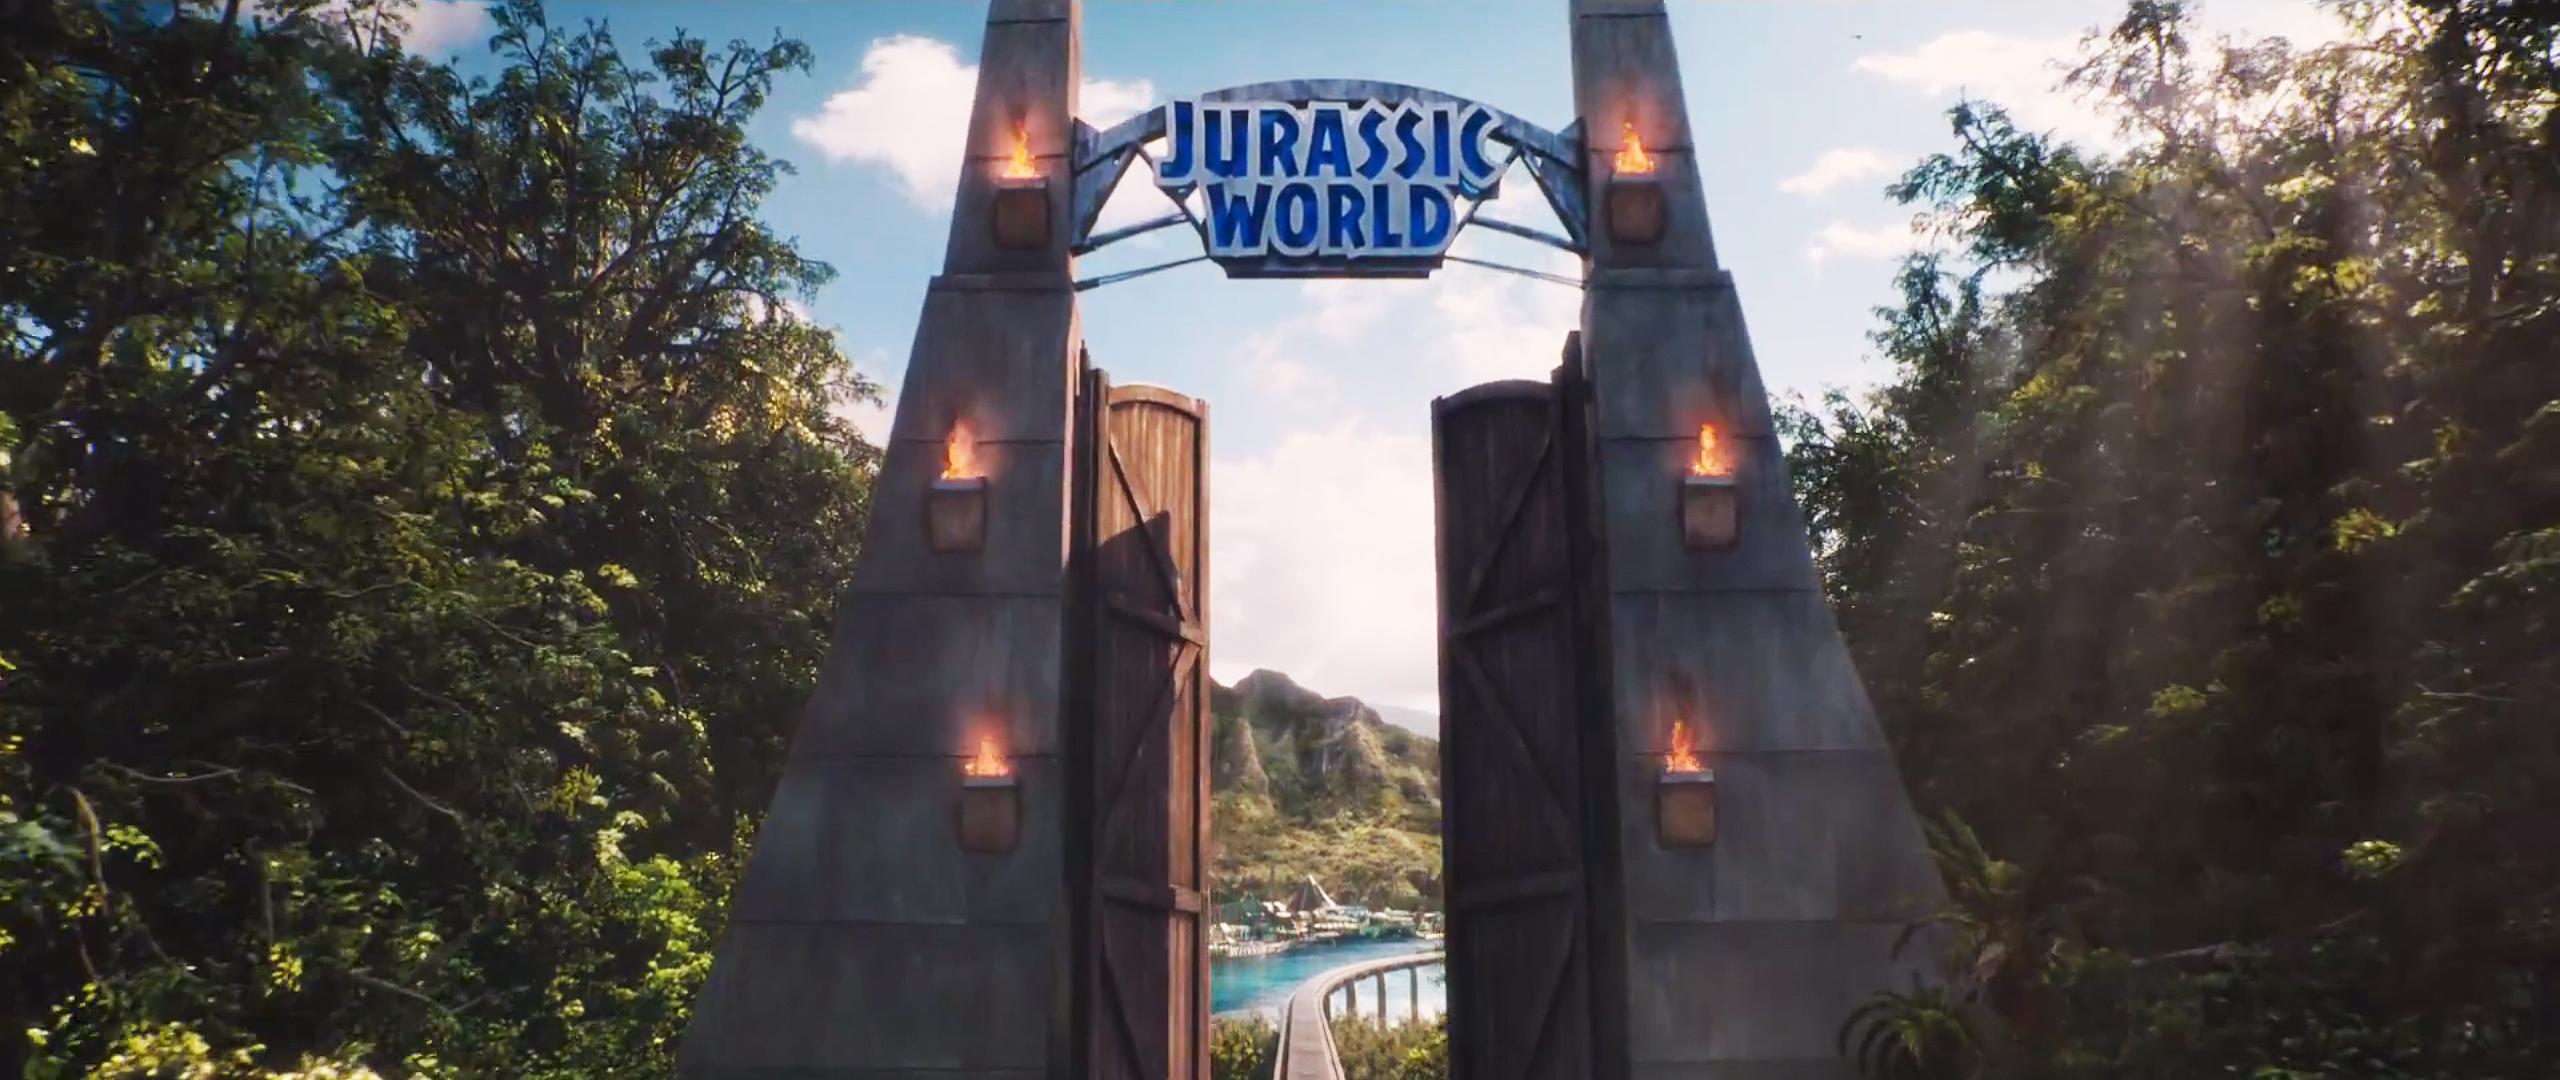 Birthday Decoration Home Jurassic World Gate Heyuguys